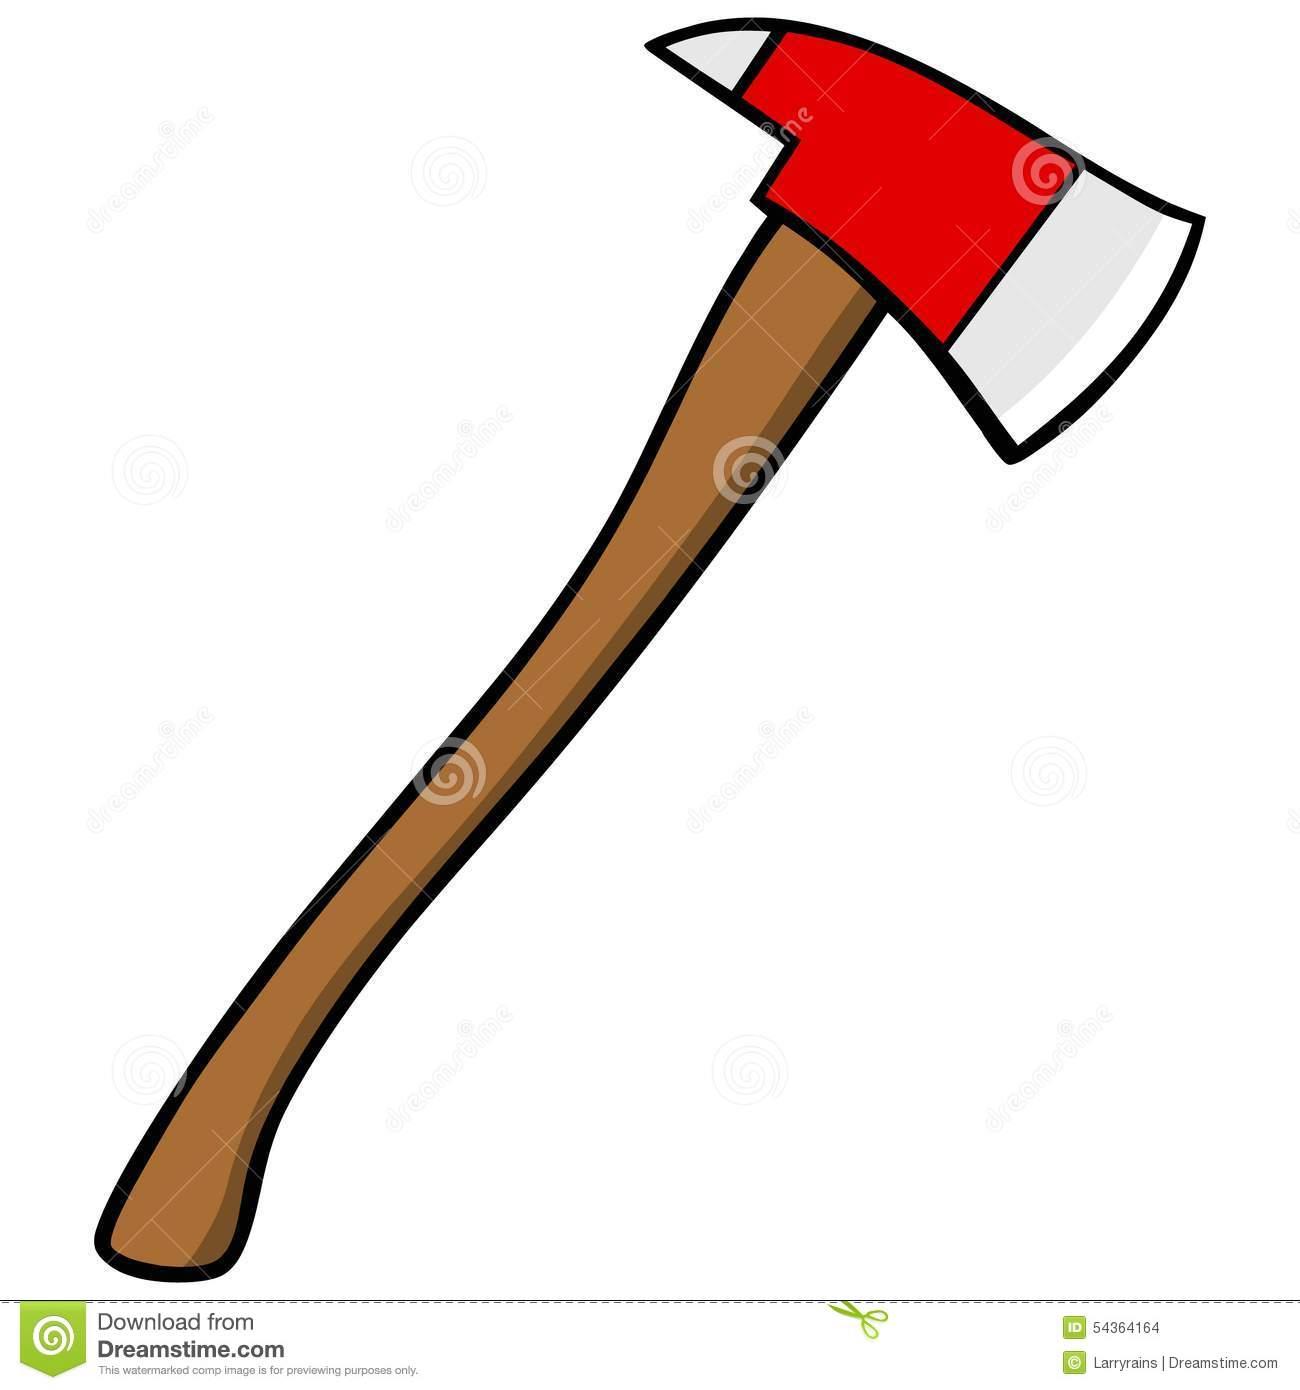 Free fire axe cliparts. Ax clipart